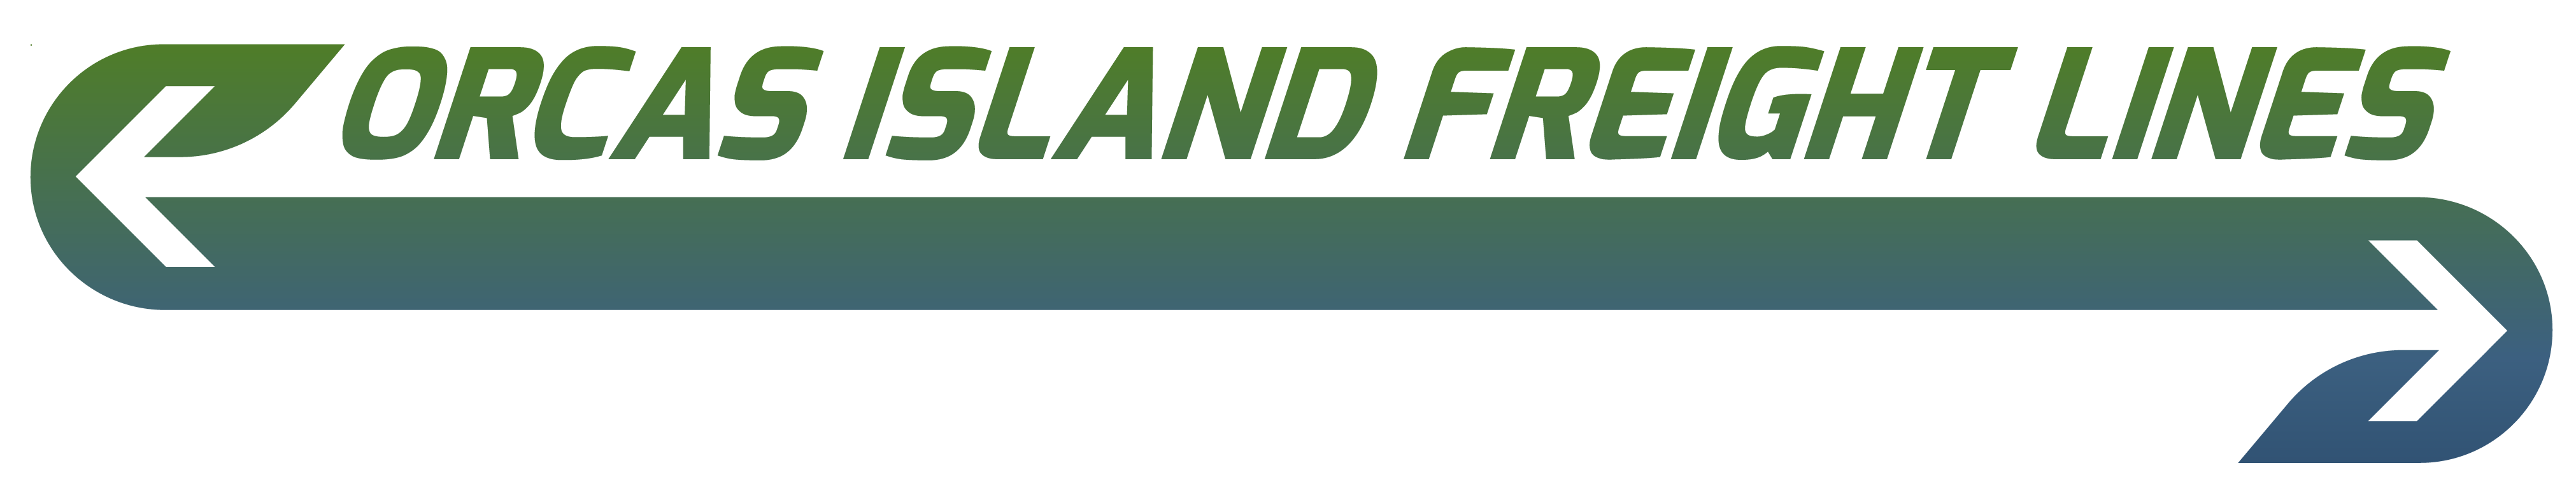 Orcas Island Freight Lines logo